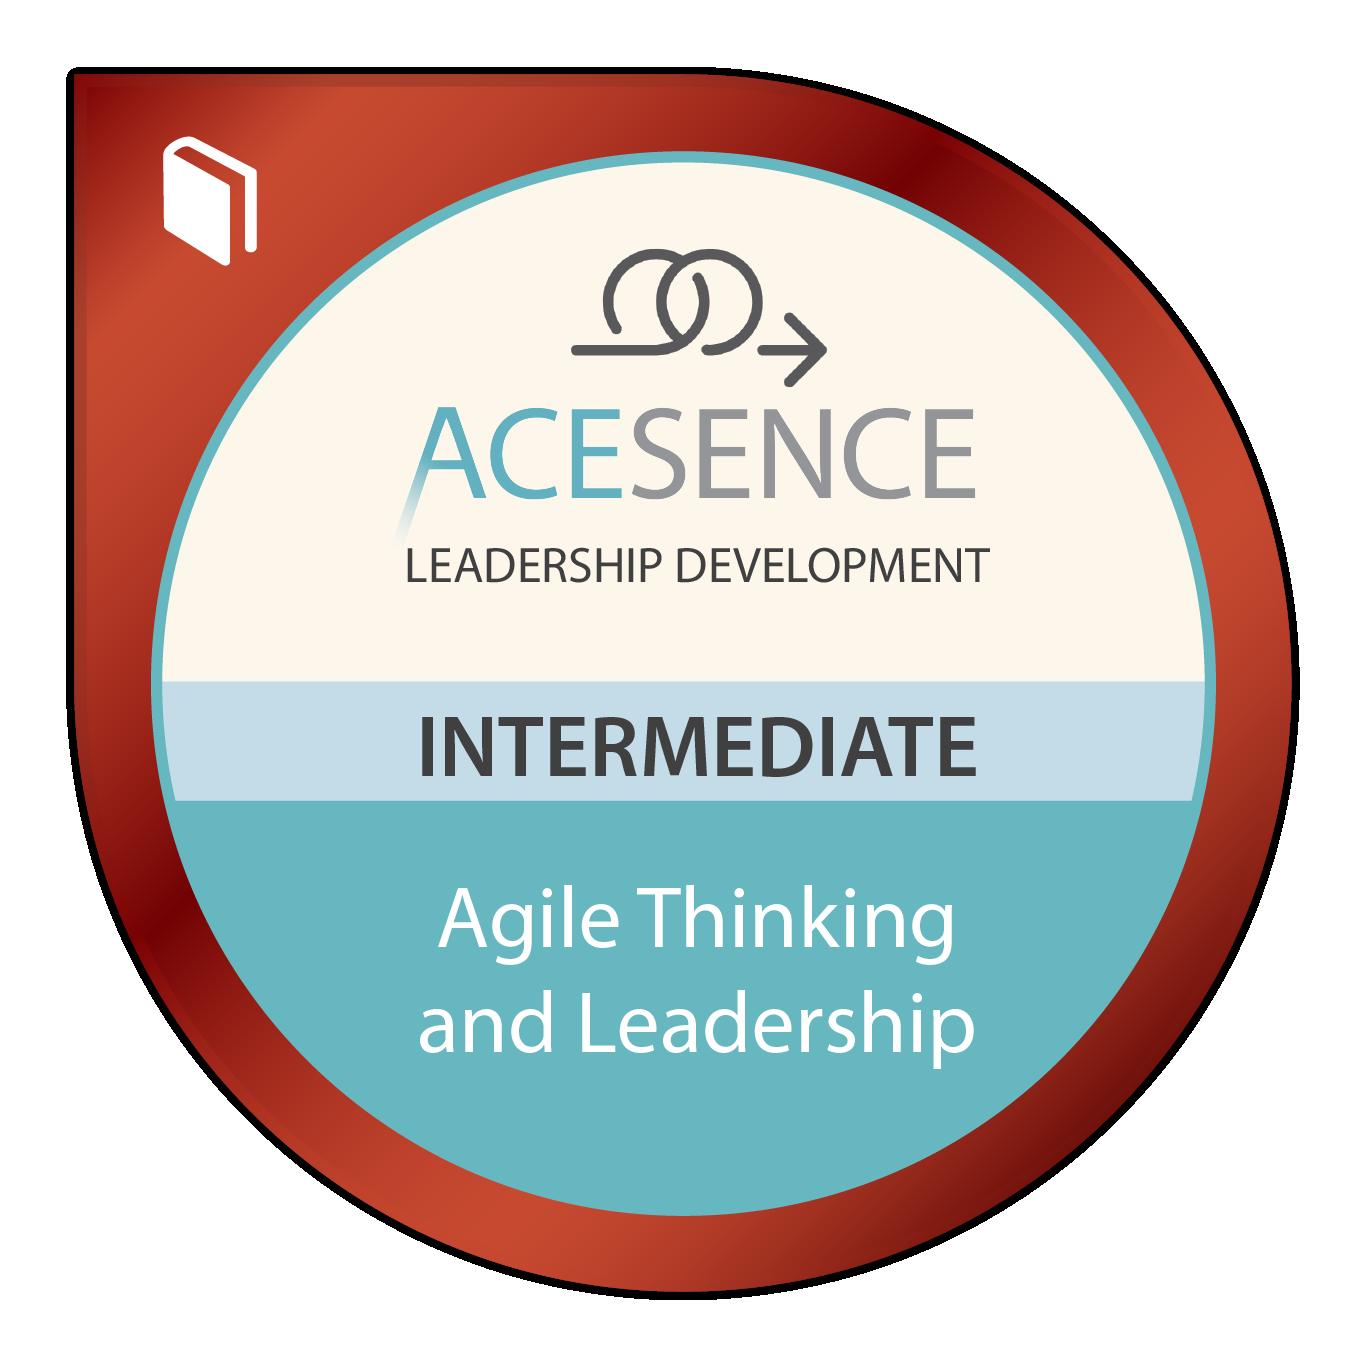 Agile Thinking and Leadership – Intermediate